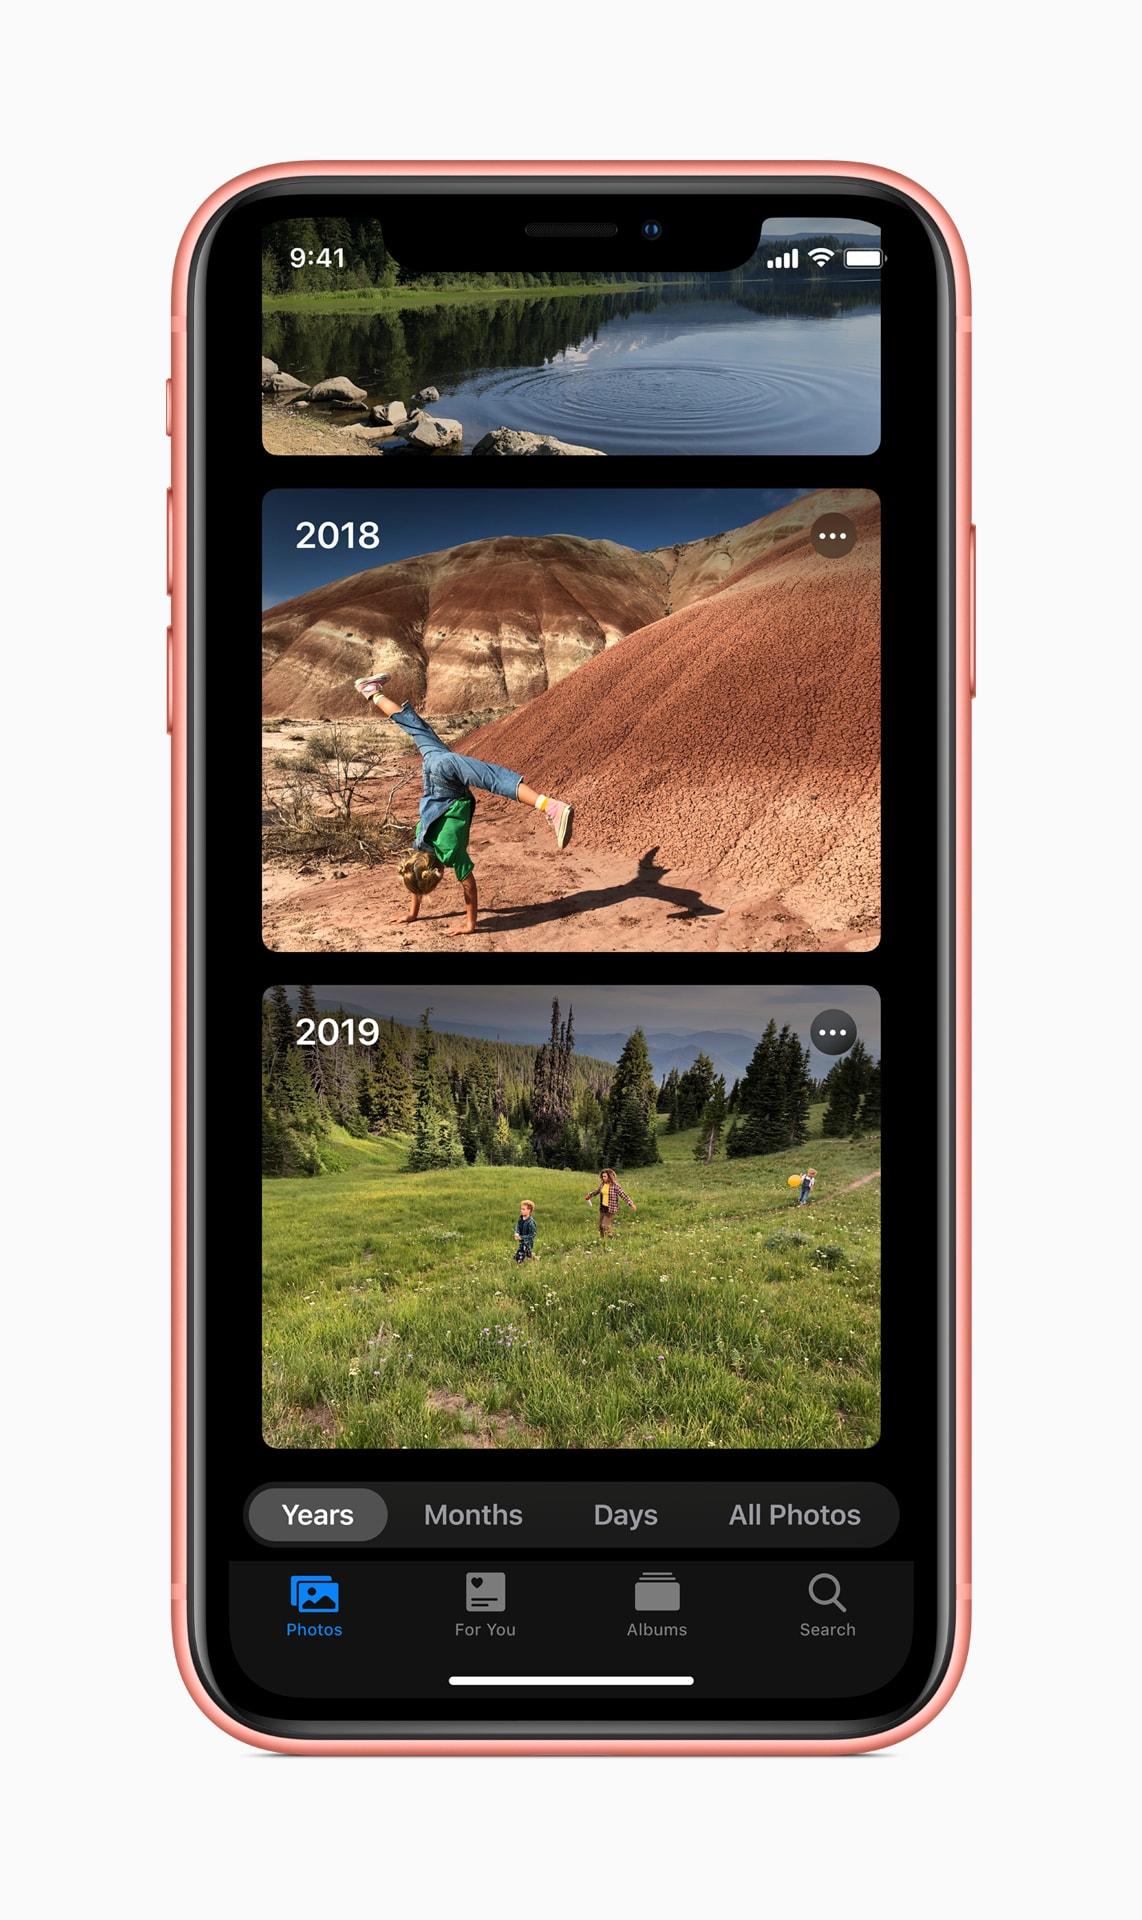 Browsing photos on iOS 13